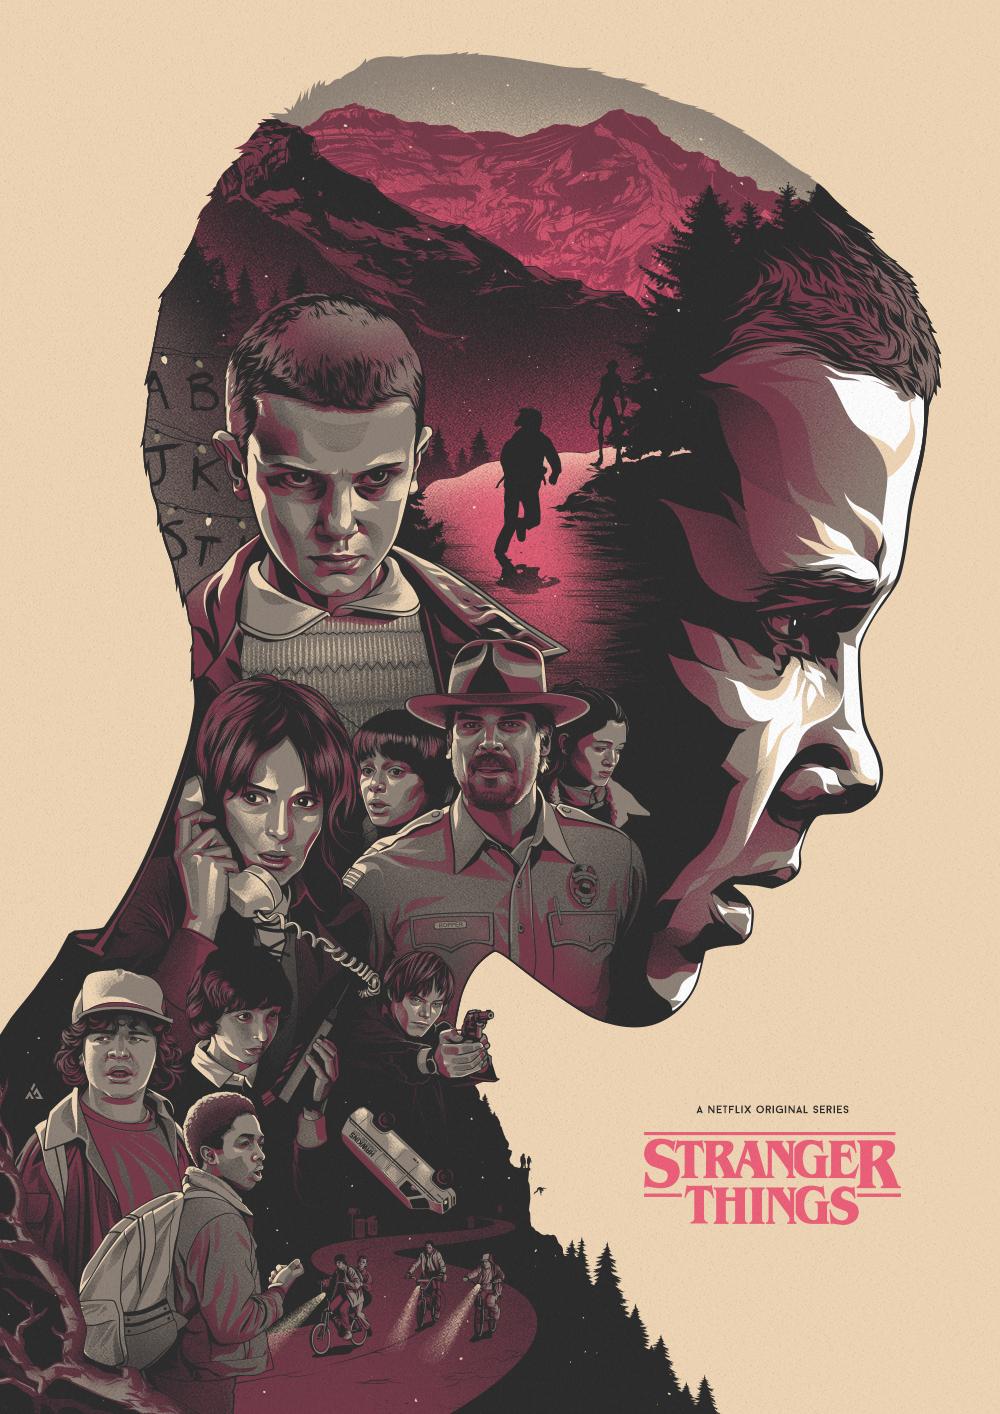 alternative movie poster double exposure Netflix fanart 80s